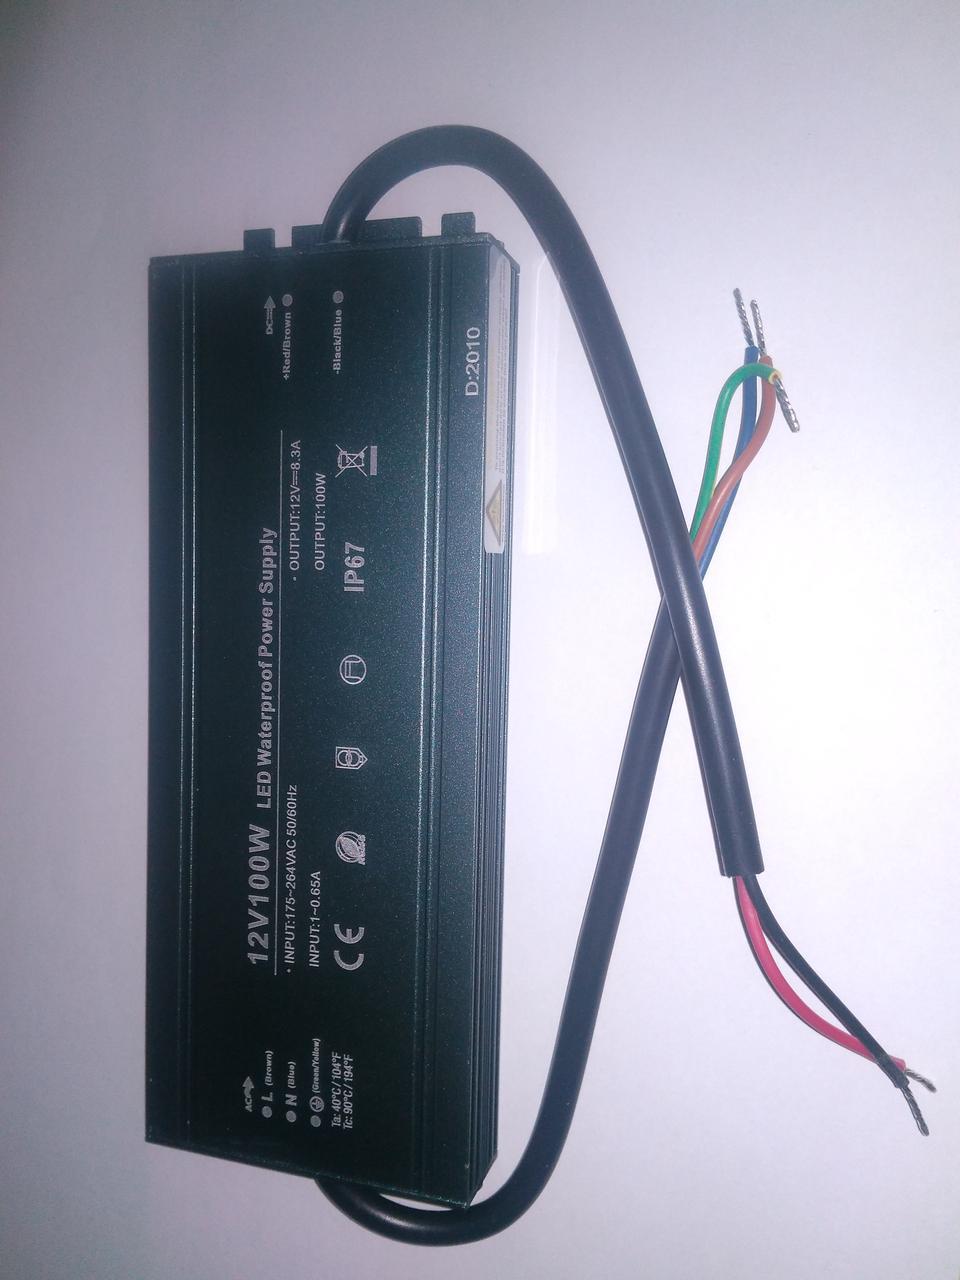 Блок живлення 12вольт 100вт PROLUM Slim герметичний IP67 223010